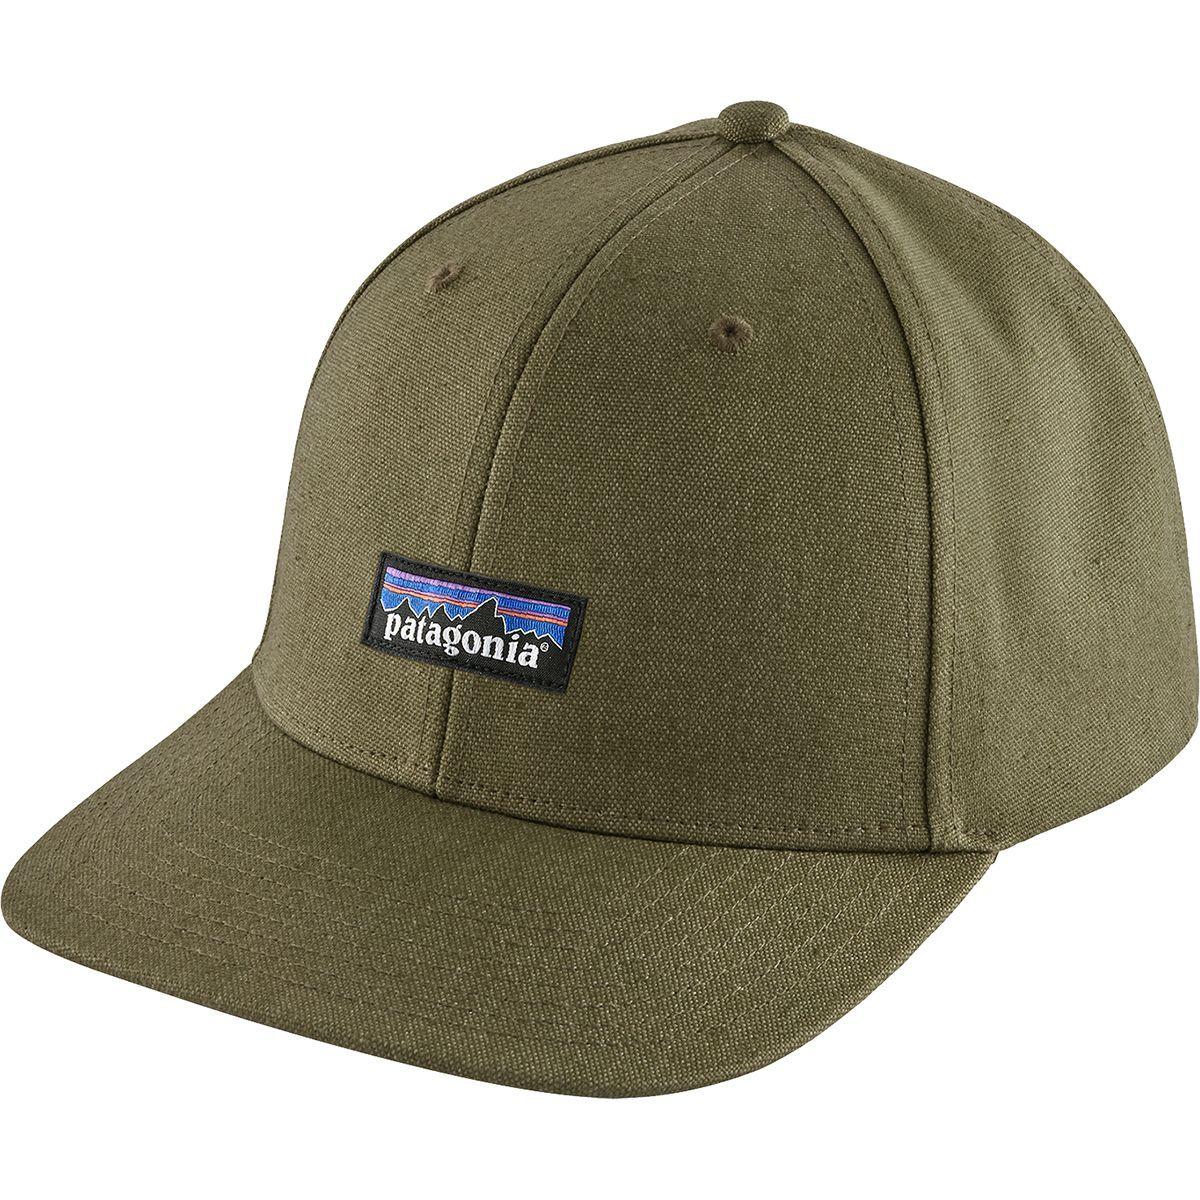 Tin Shed Outdoor Hats Hats: Tin Shed, Patagonia, Patagonia Cap